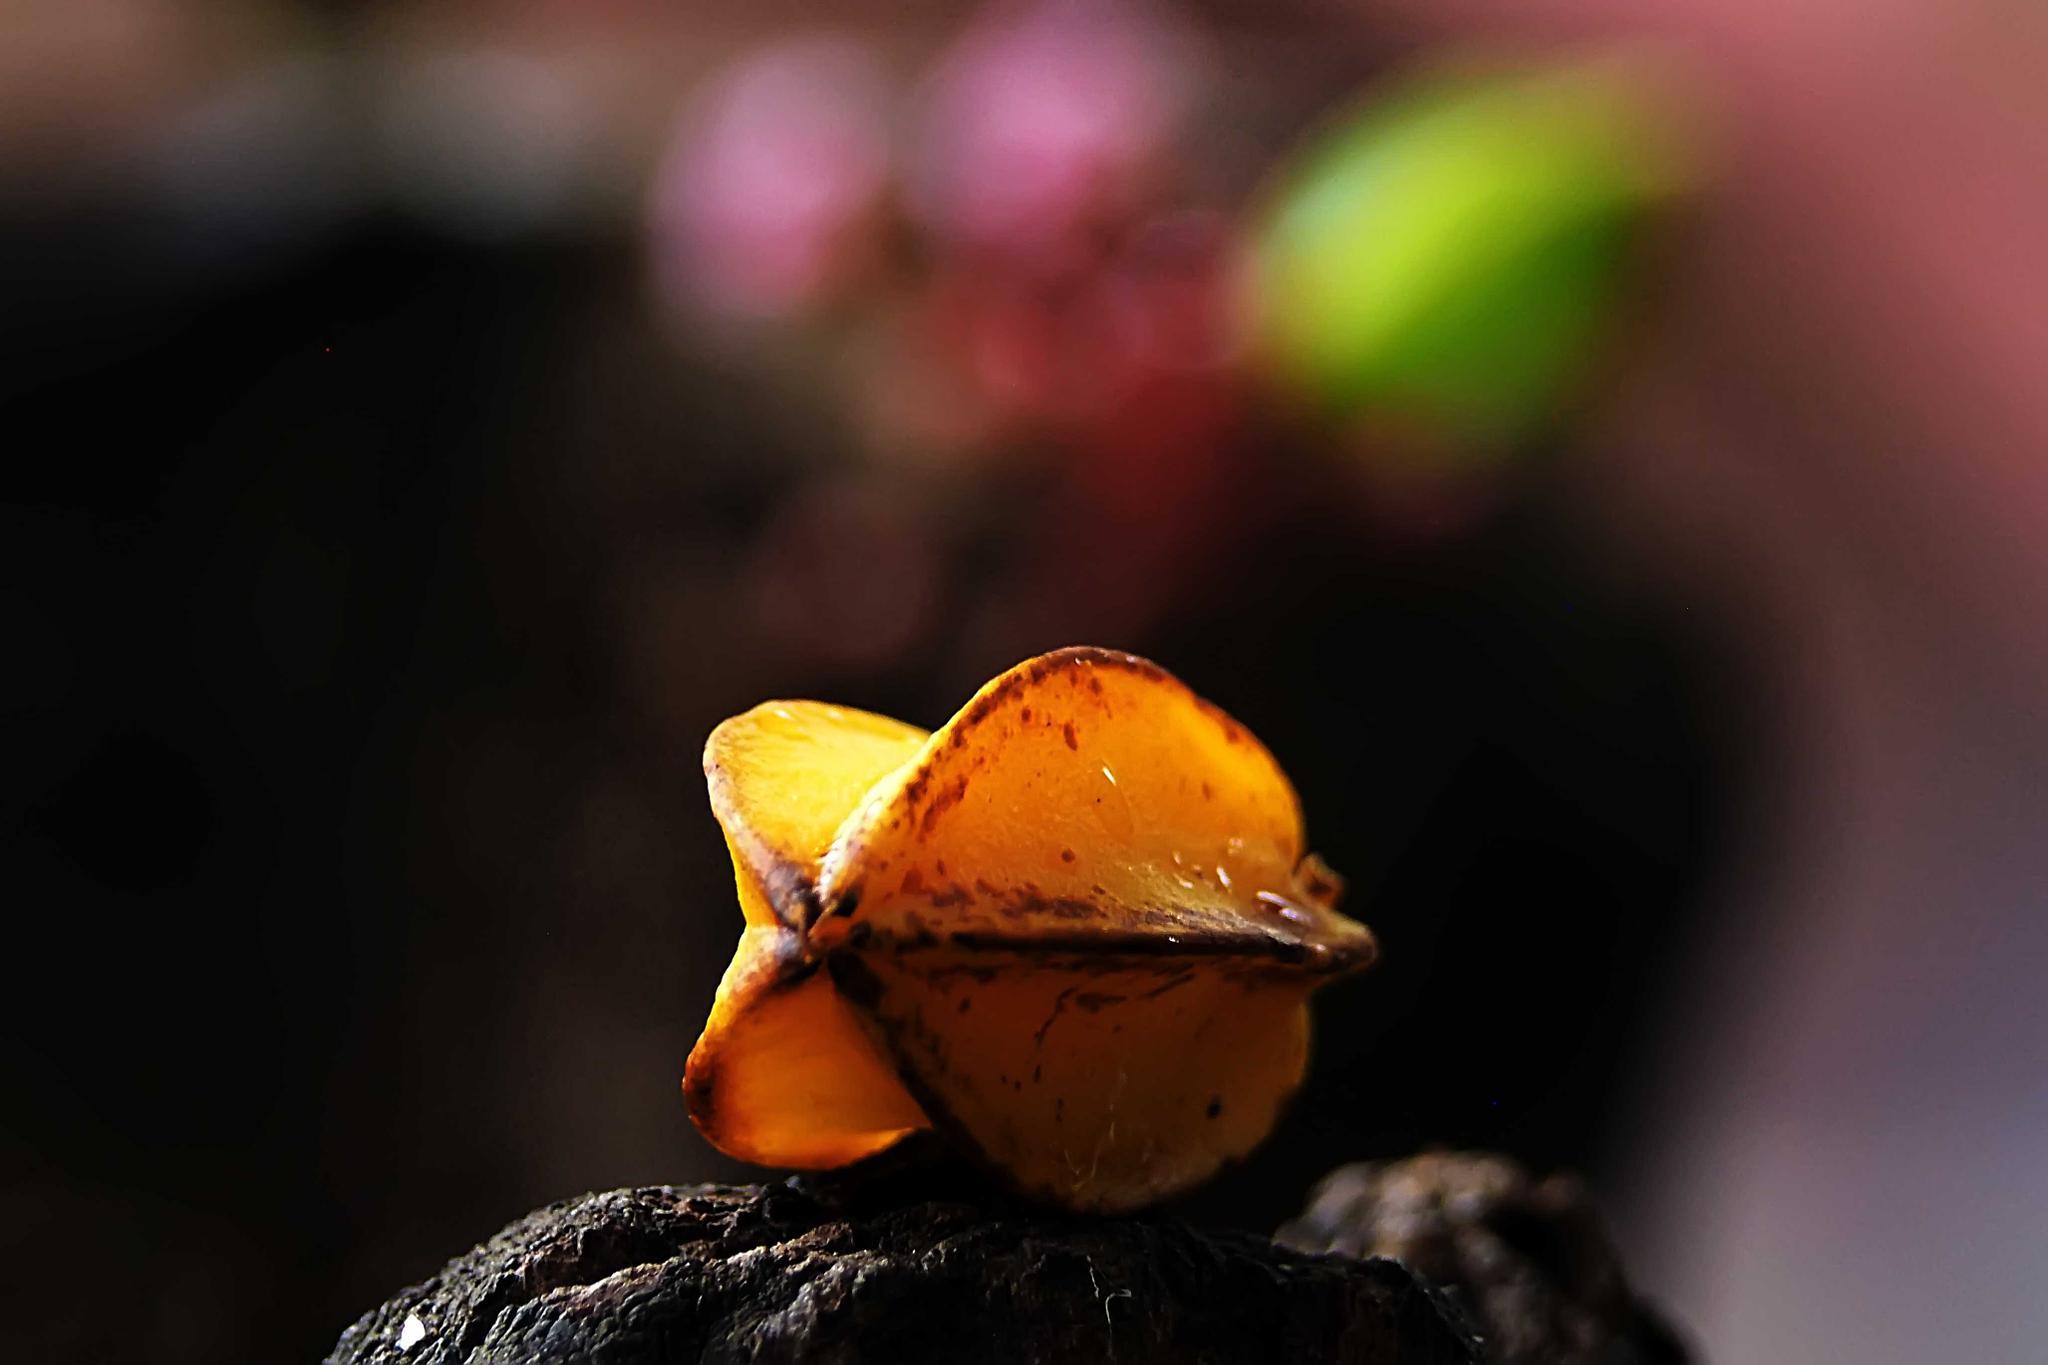 Untitled by Tran Ngoc Nghi